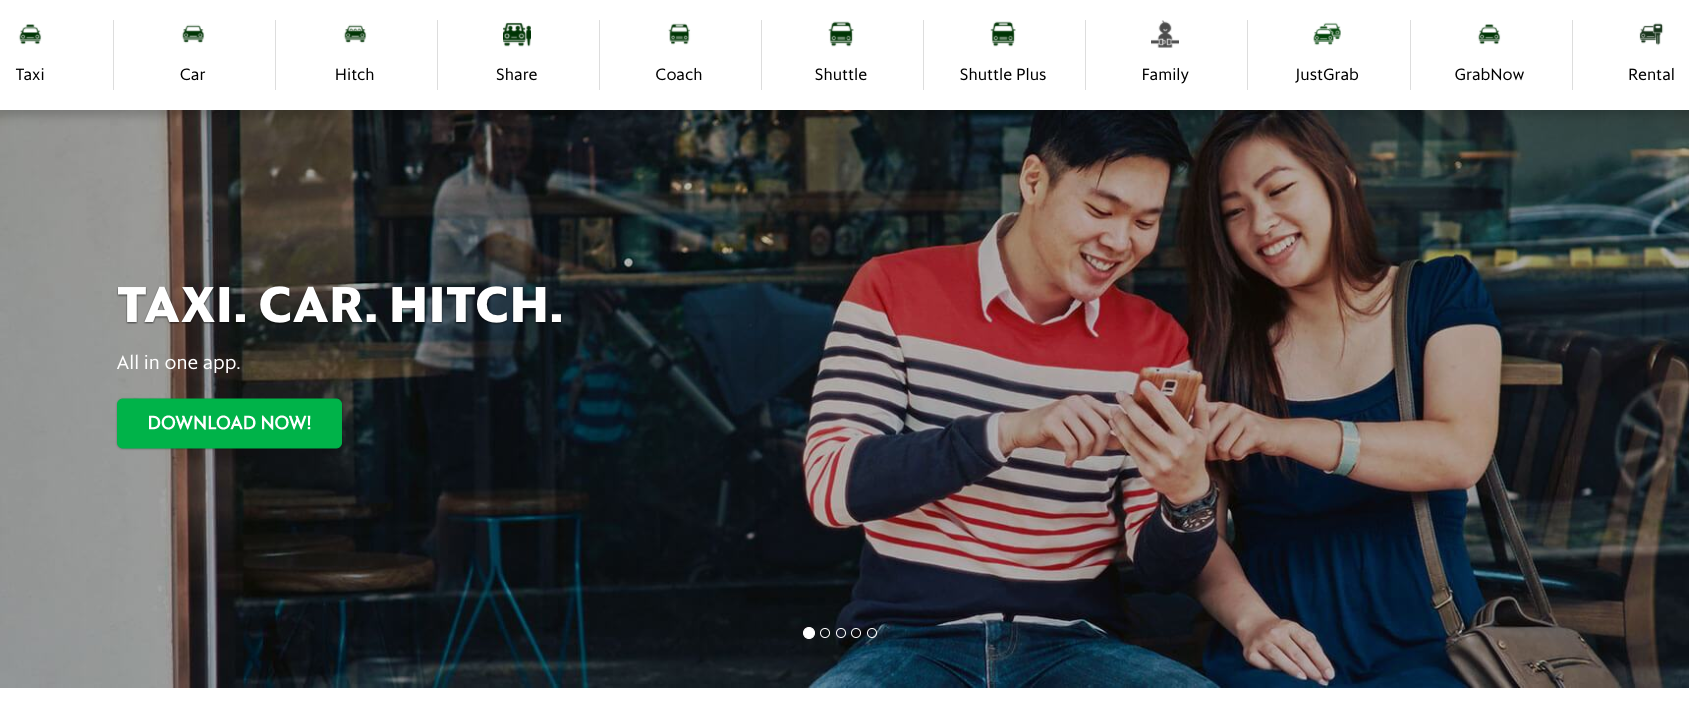 Grab Homepage